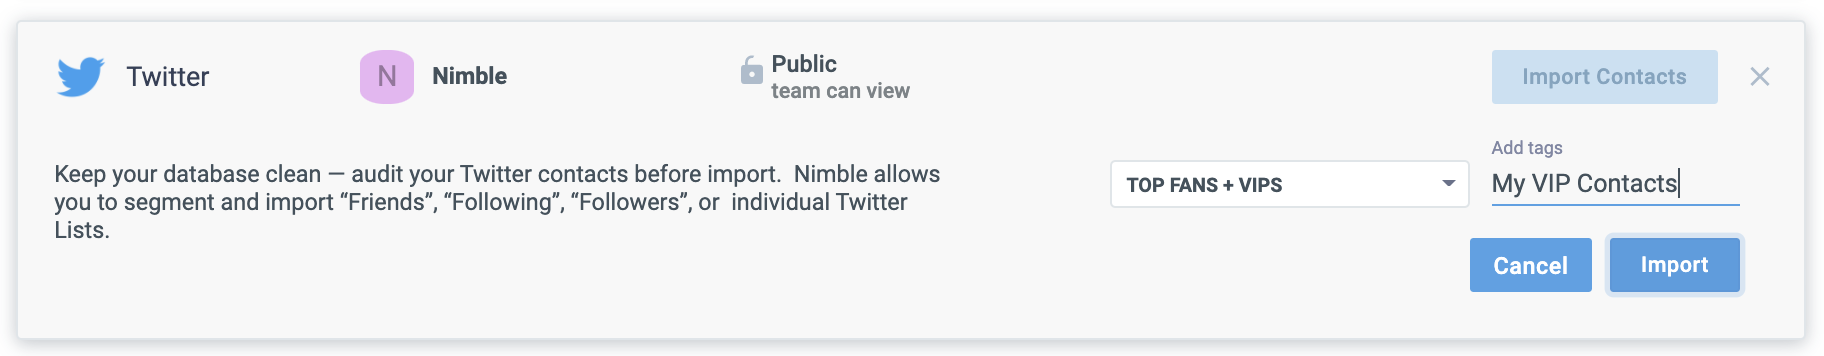 Twitter  captura de pantalla de importación de contactos